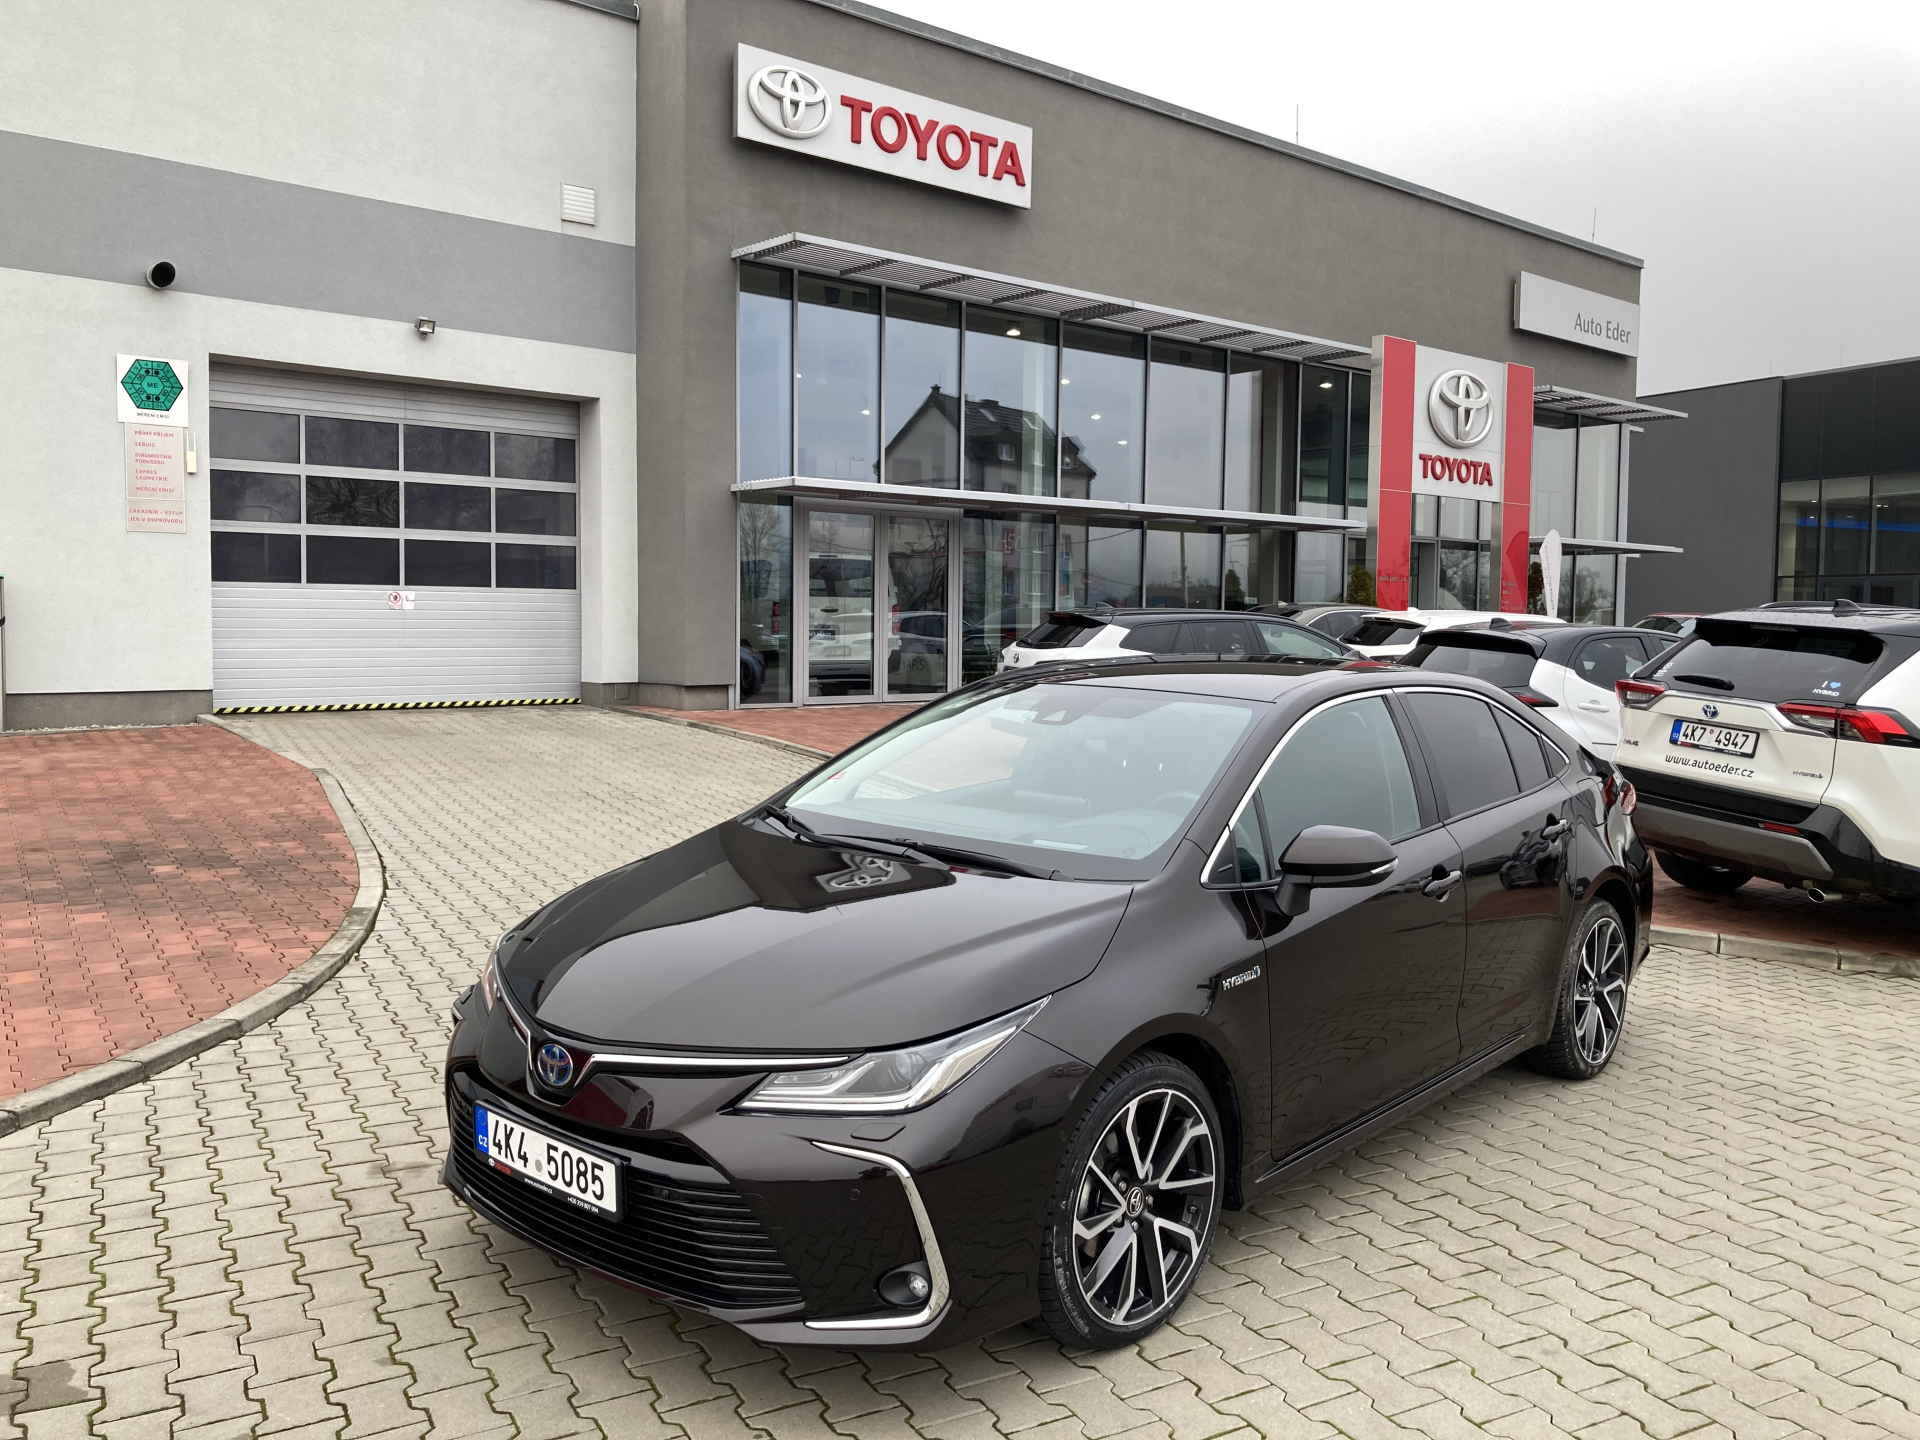 Toyota COROLLA Sedan 1,8 Hybrid (122 k) aut. e-CVT Executive VIP